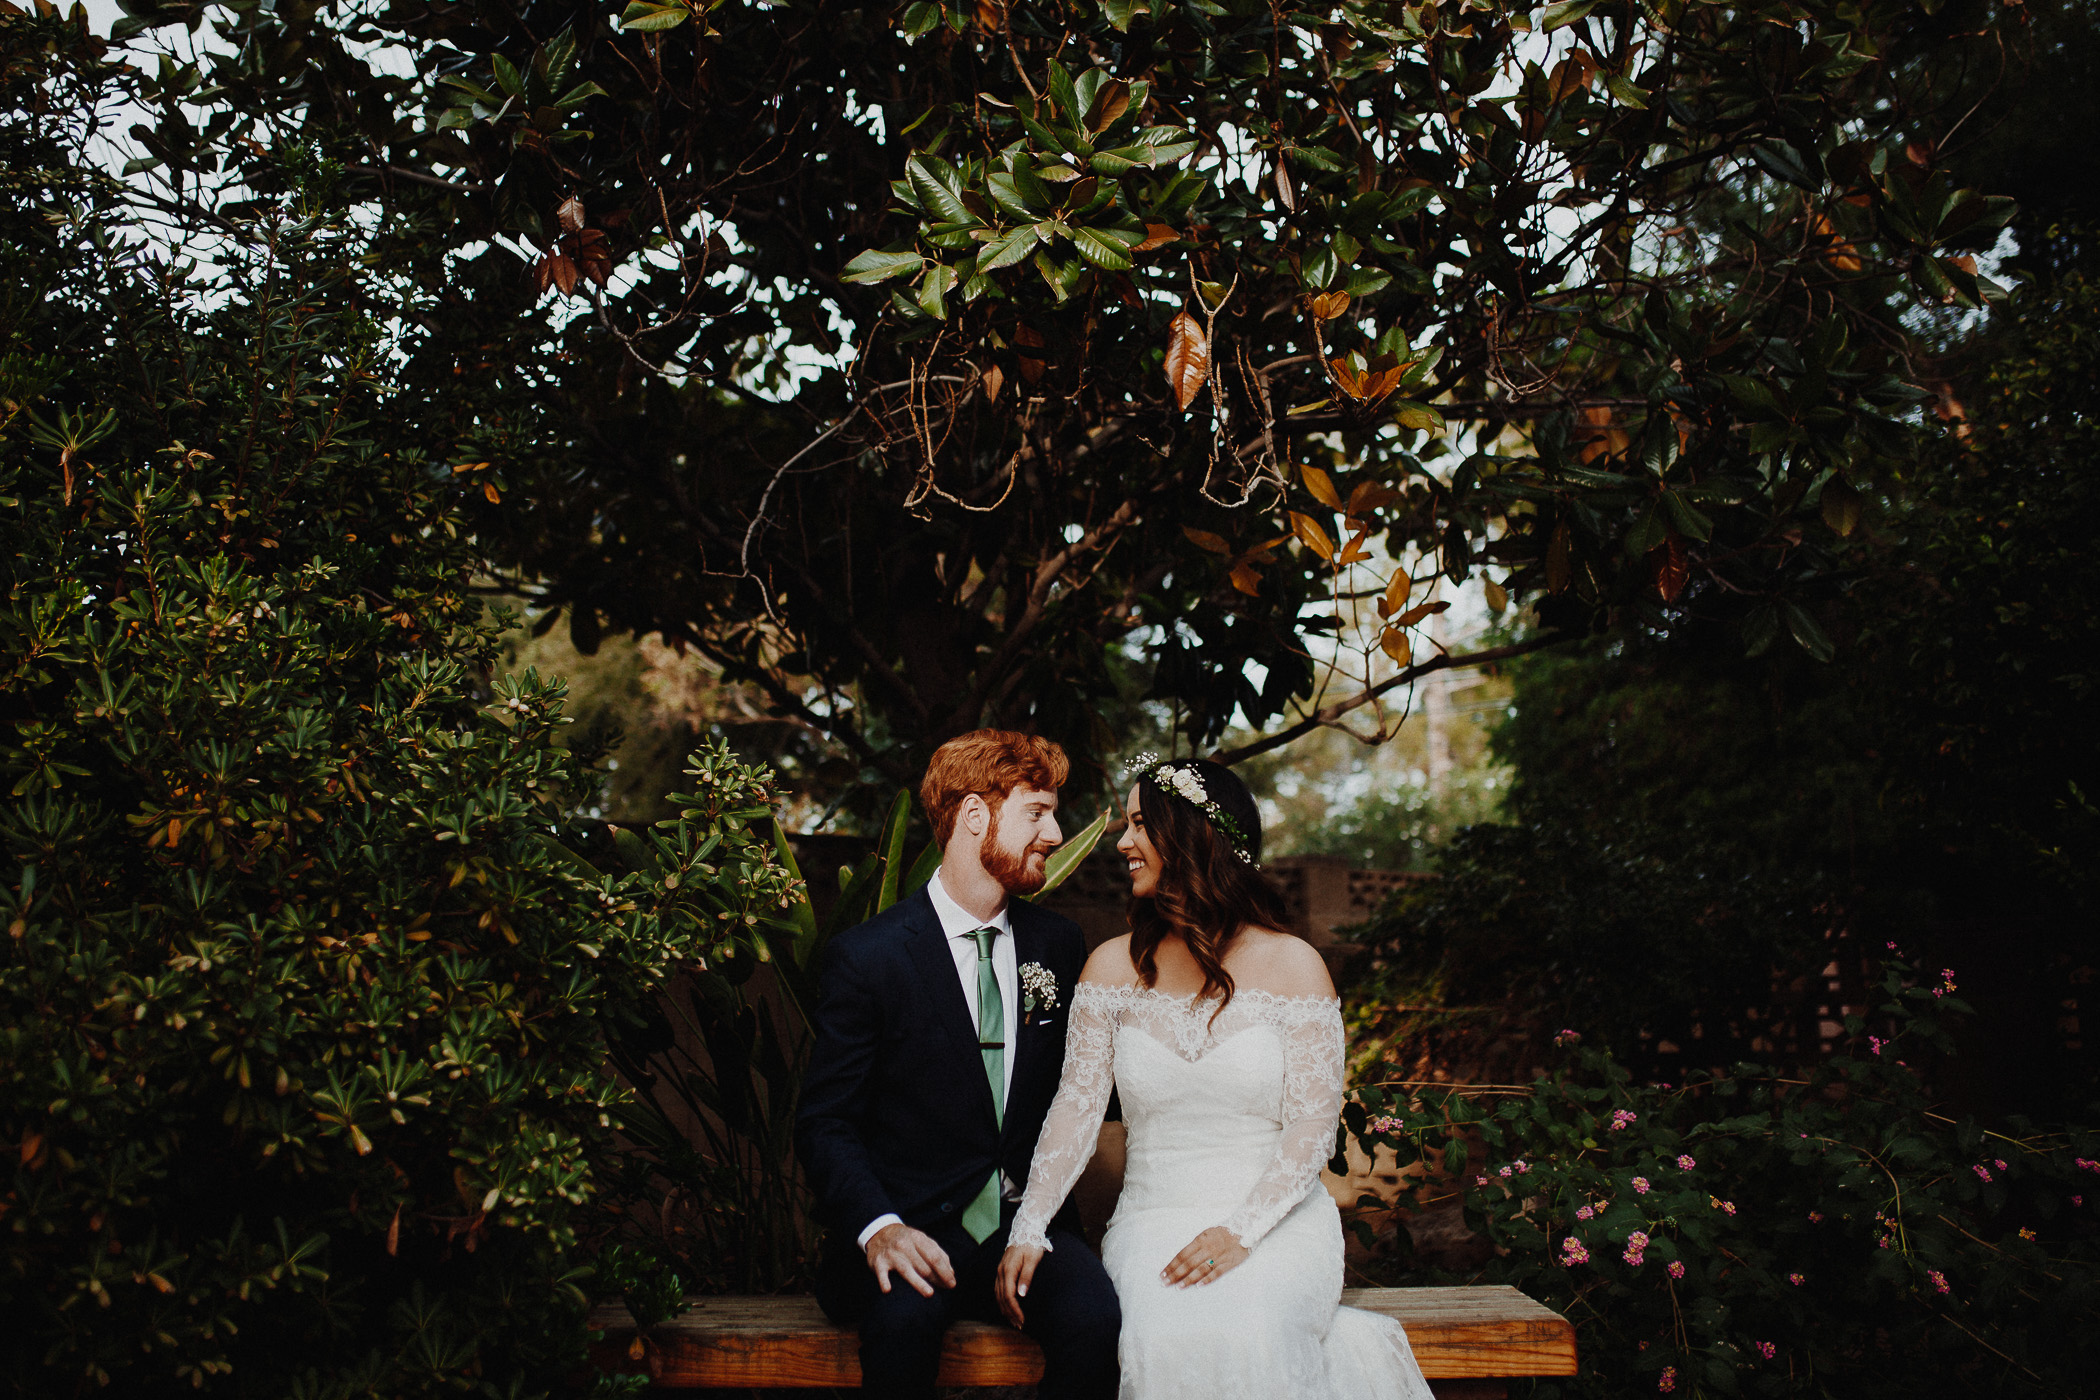 181104-Luxium-Weddings-Arizona-@matt__Le-Brandon-Kariana-Phoenix-Valley-Garden-Center-1097.jpg